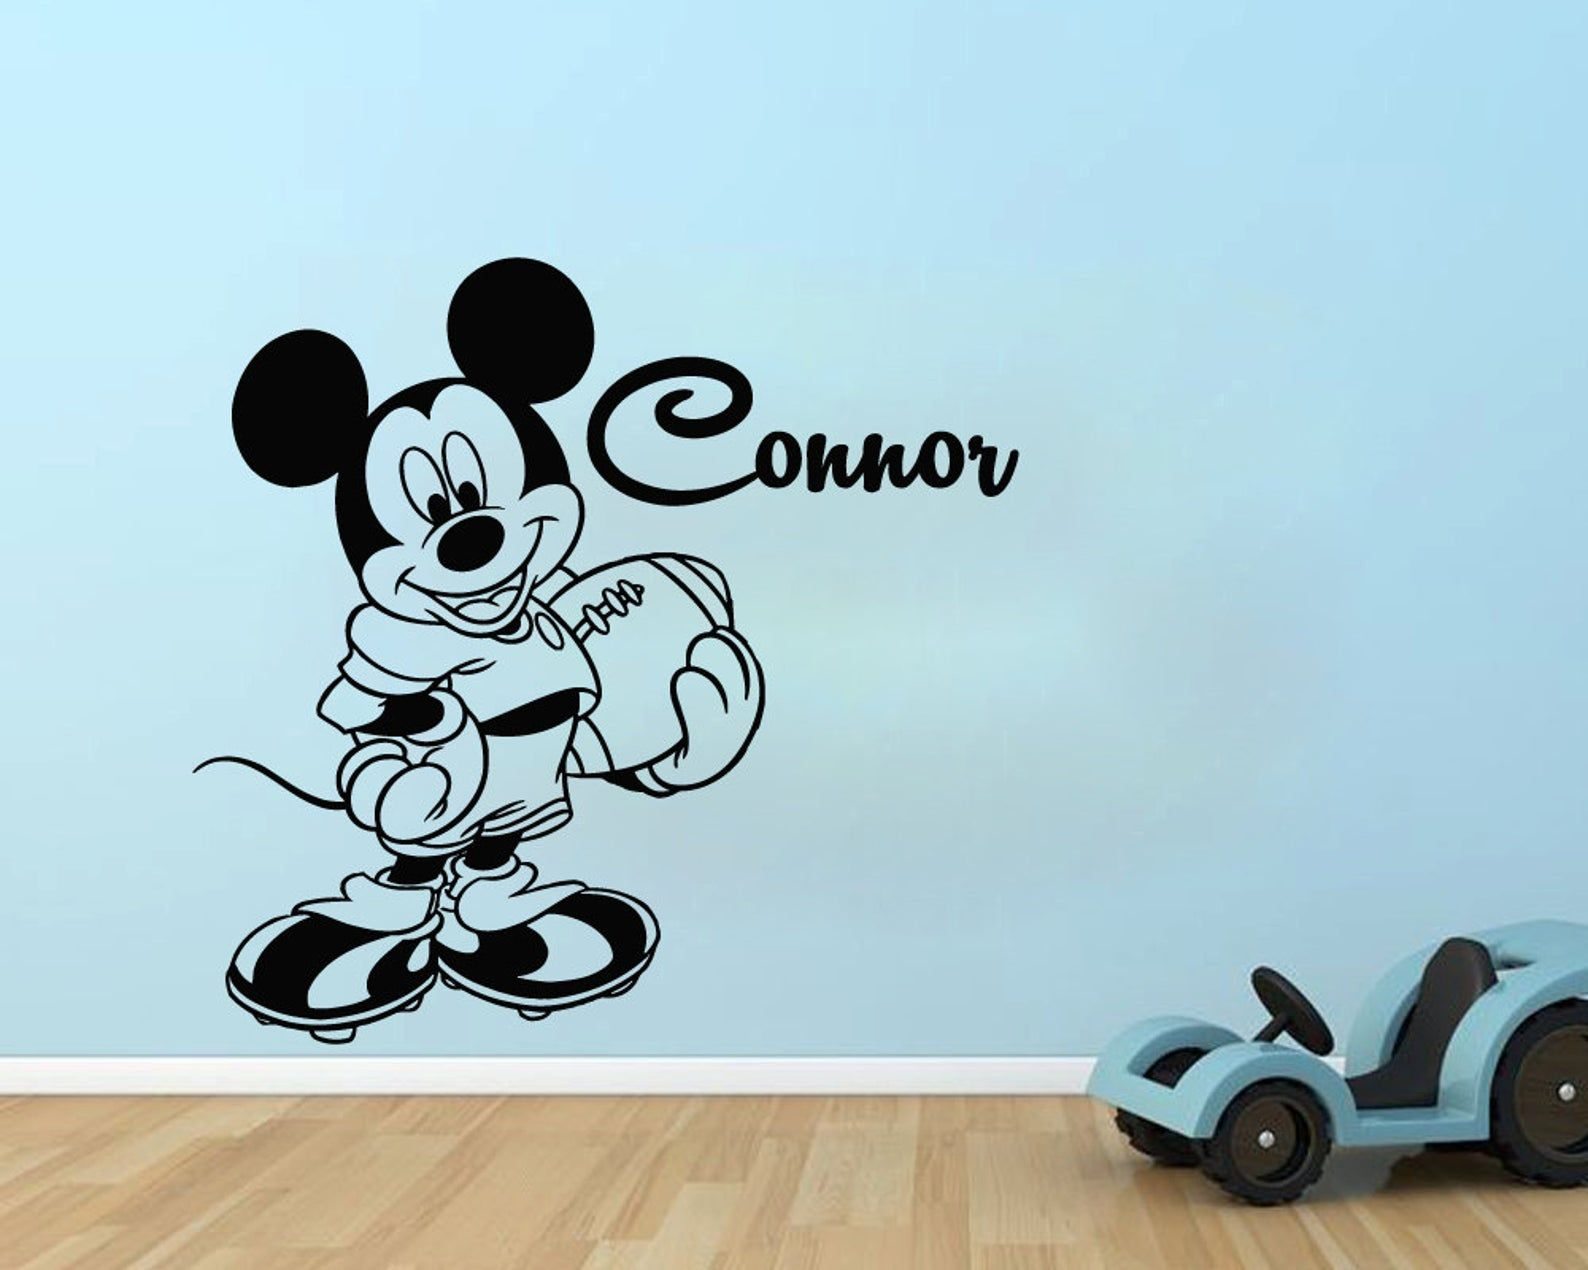 Nursery-Home Bedroom Gamer Personalized /& Custom Wall Decal Vinyl Sticker